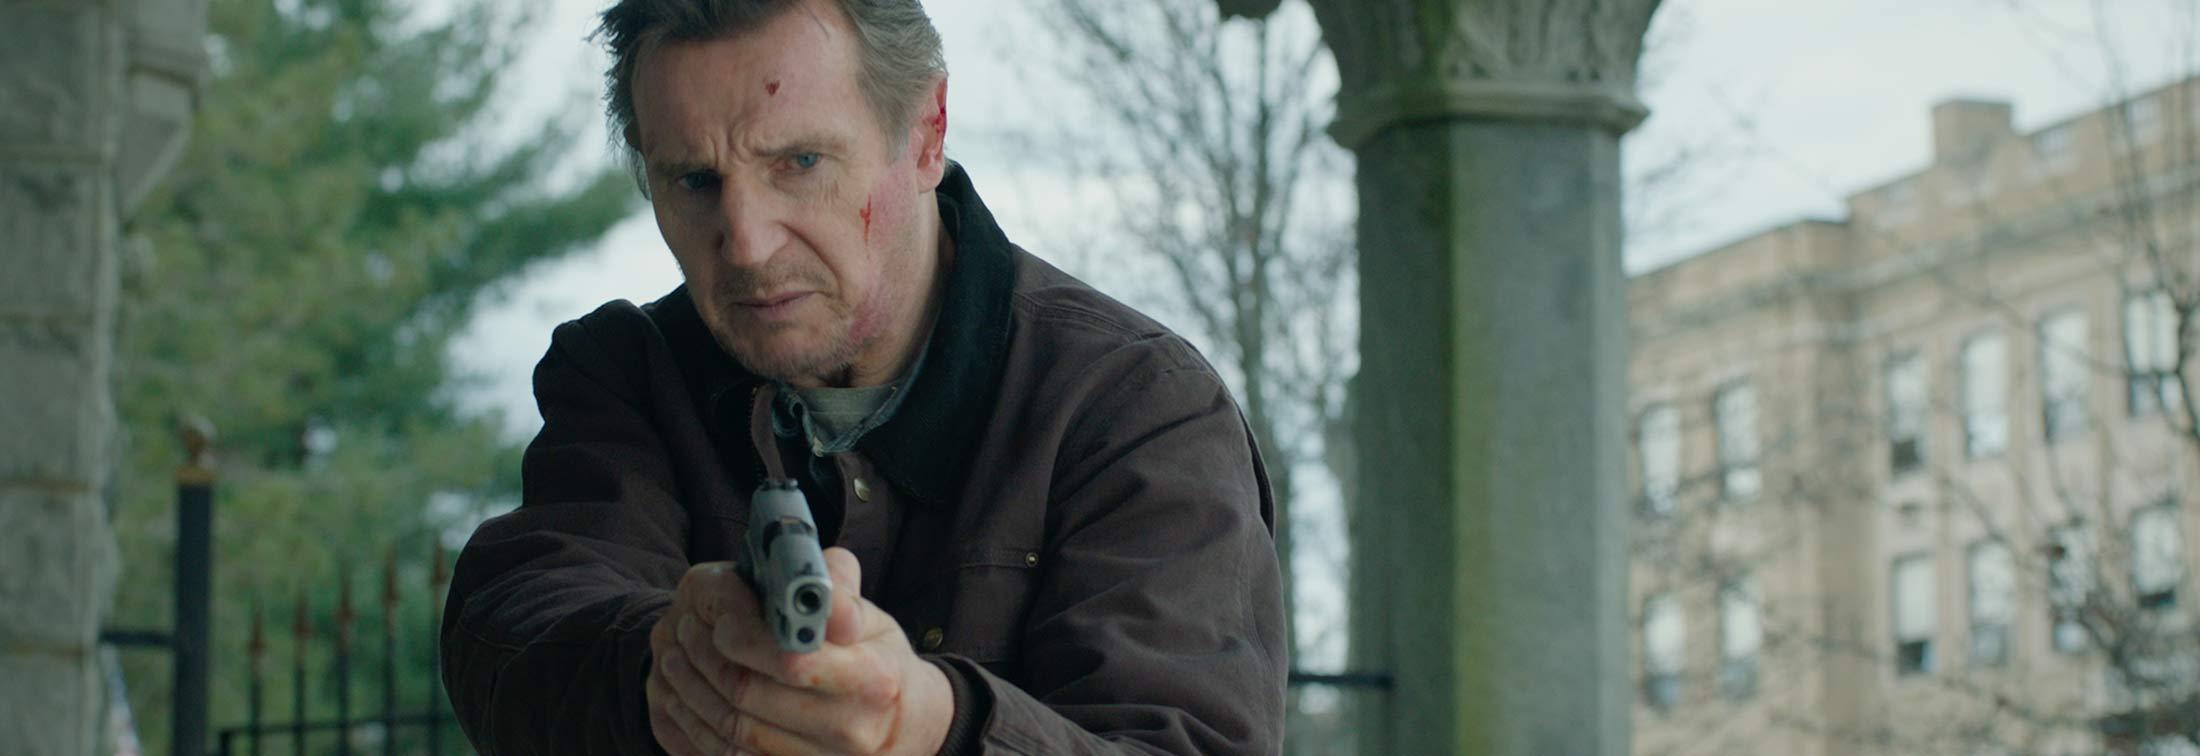 Honest Thief - Liam Neeson's double-crossing crime drama